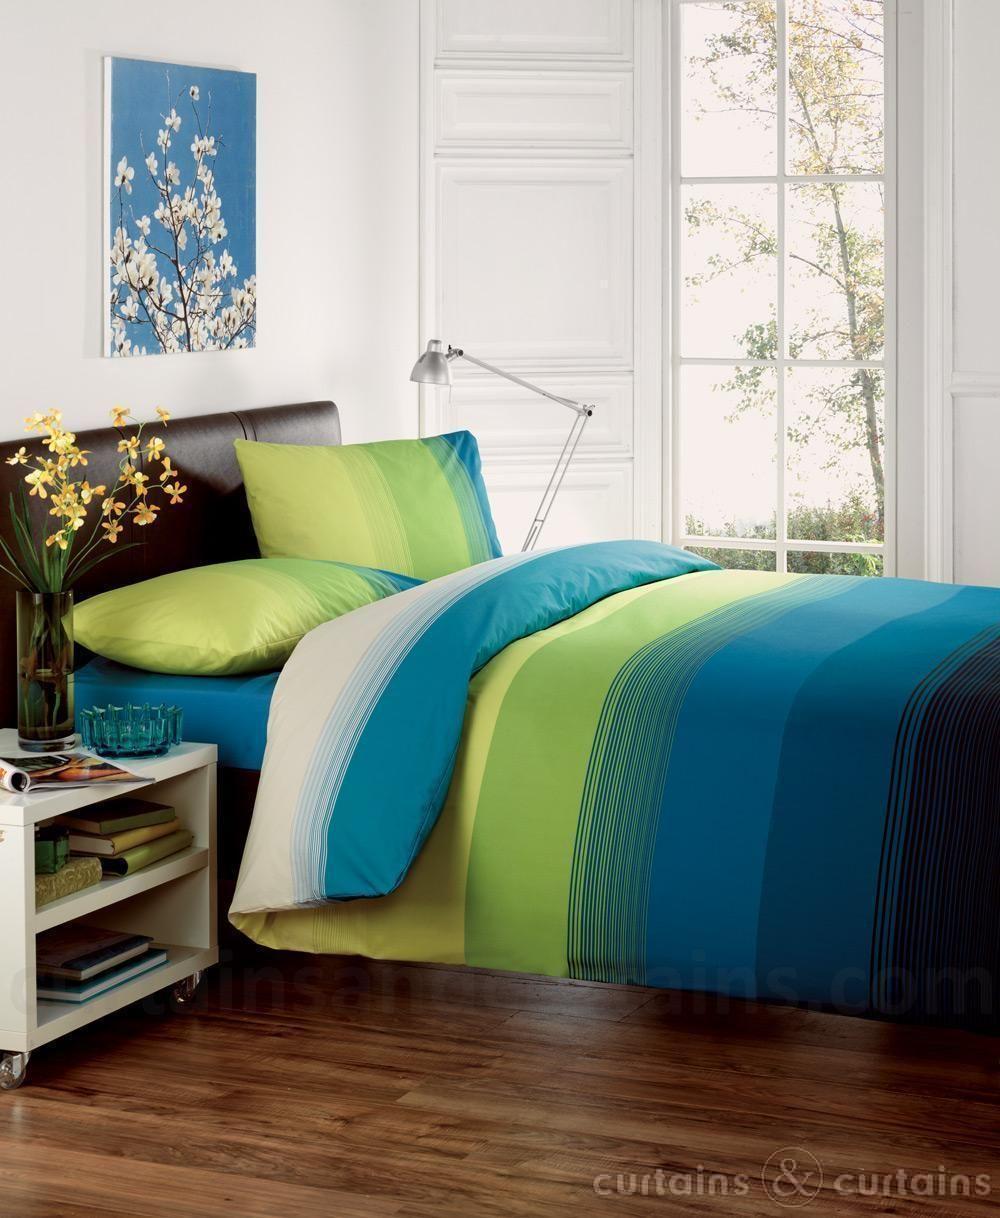 studio lime green teal striped print duvet cover beds uk quilt cover and teal blue. Black Bedroom Furniture Sets. Home Design Ideas